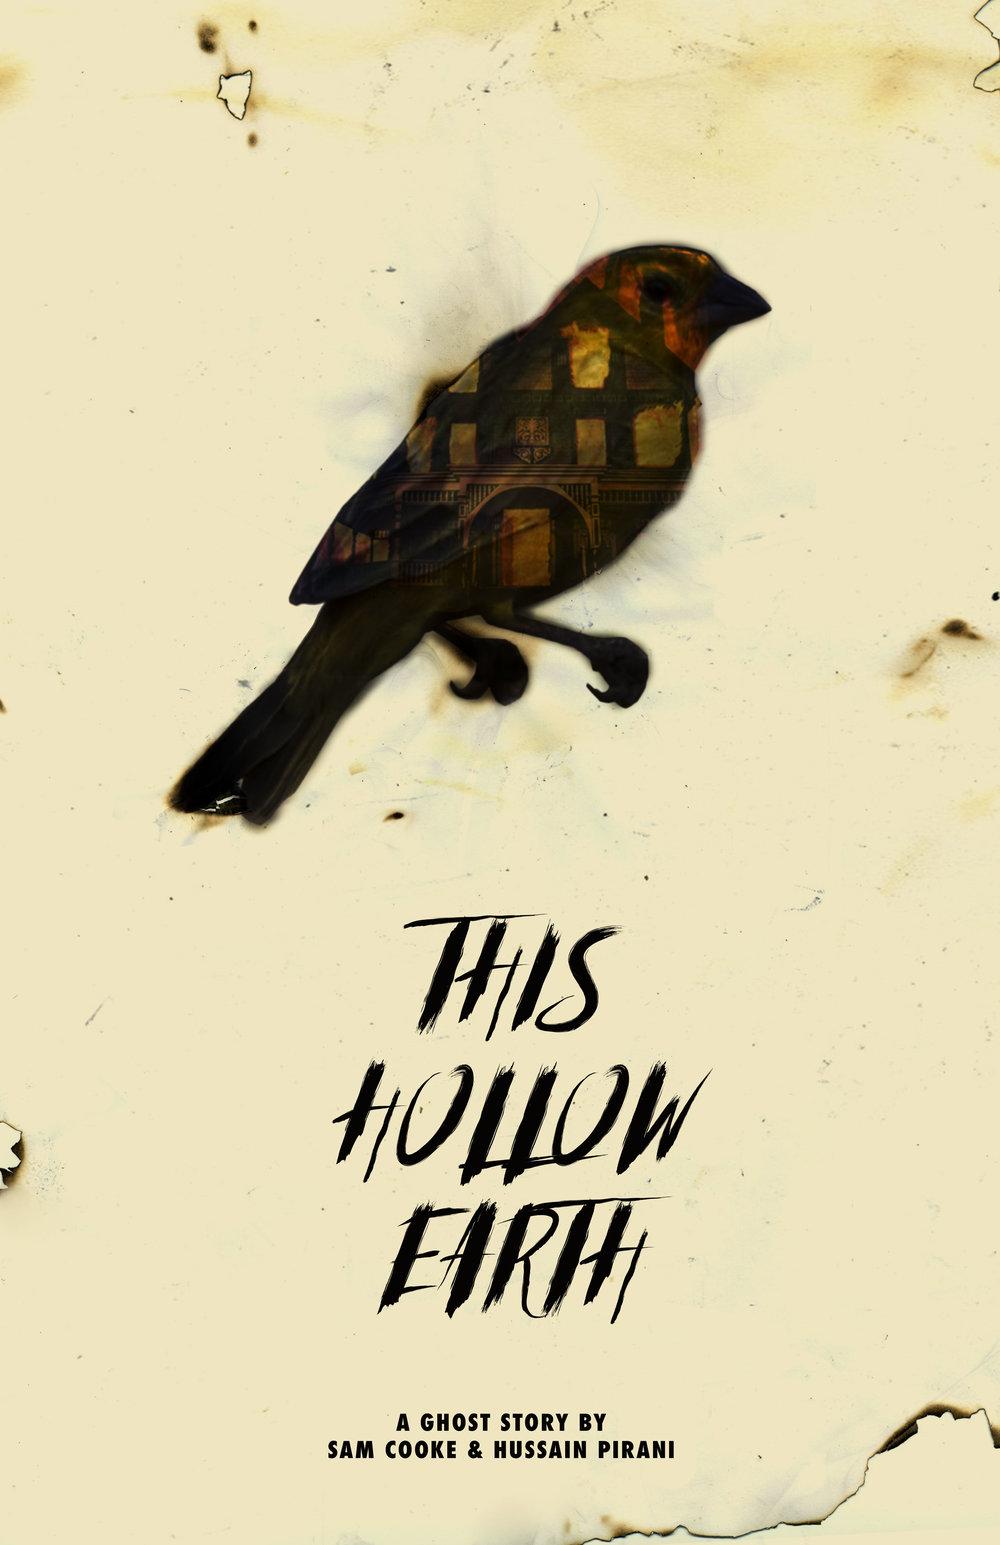 THISHOLLOWEARTH_poster.jpg